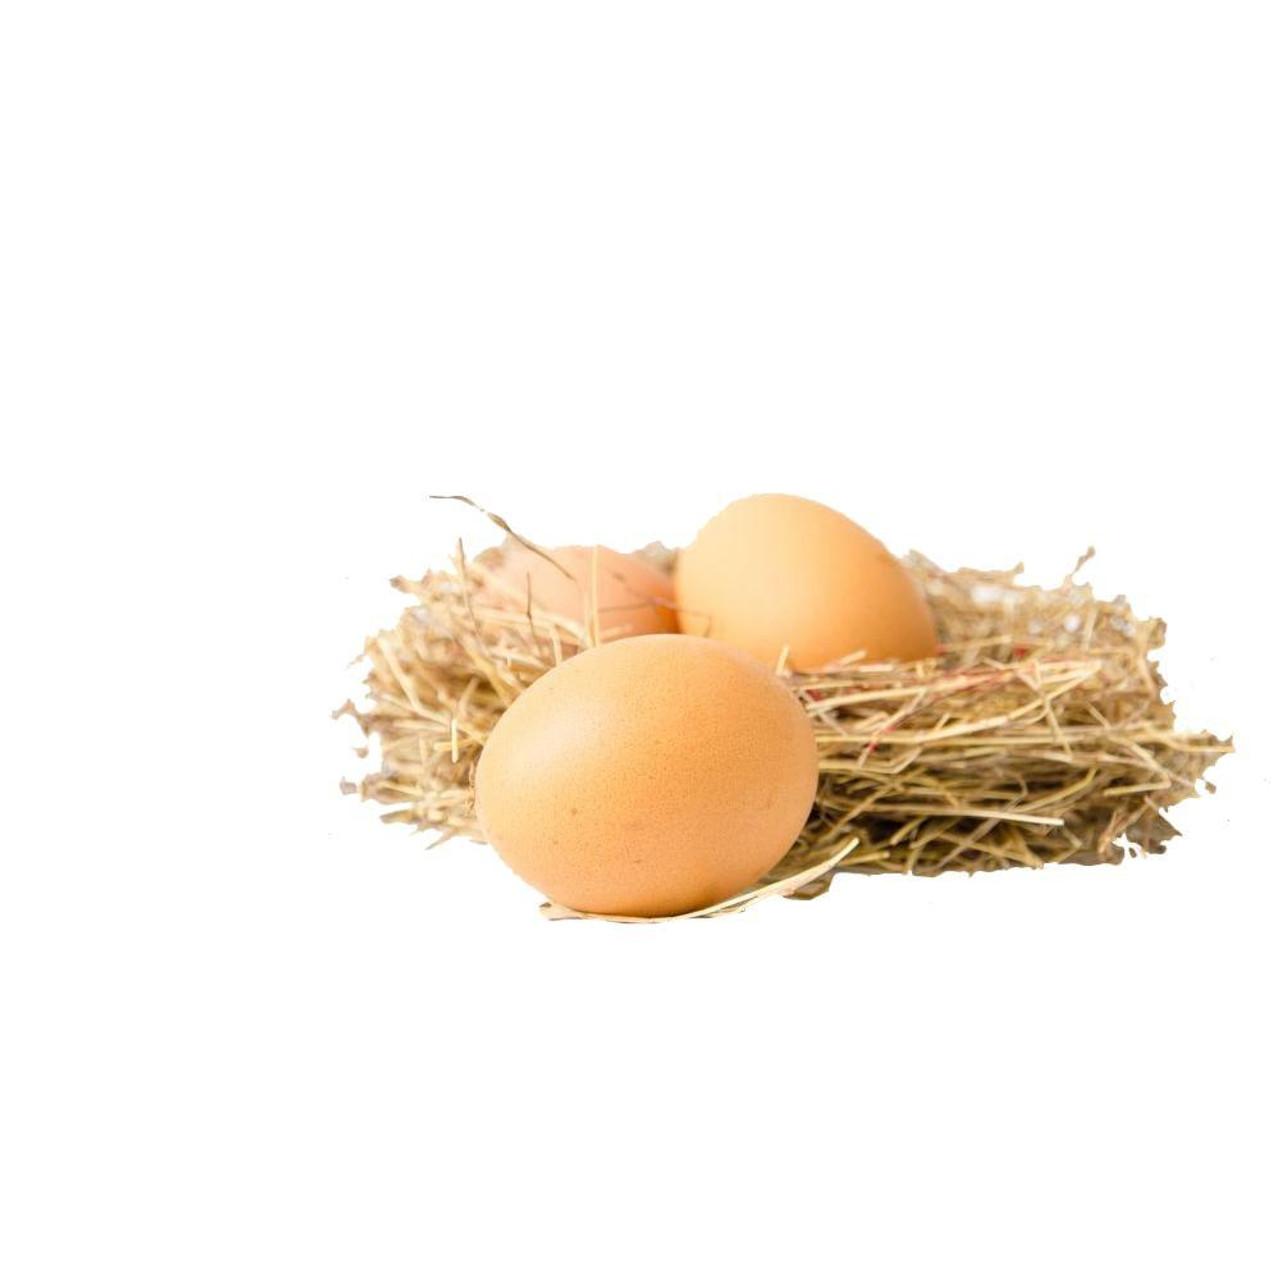 1 Dozen Brown Ceramic Nest Eggs in Grade A Large Carton